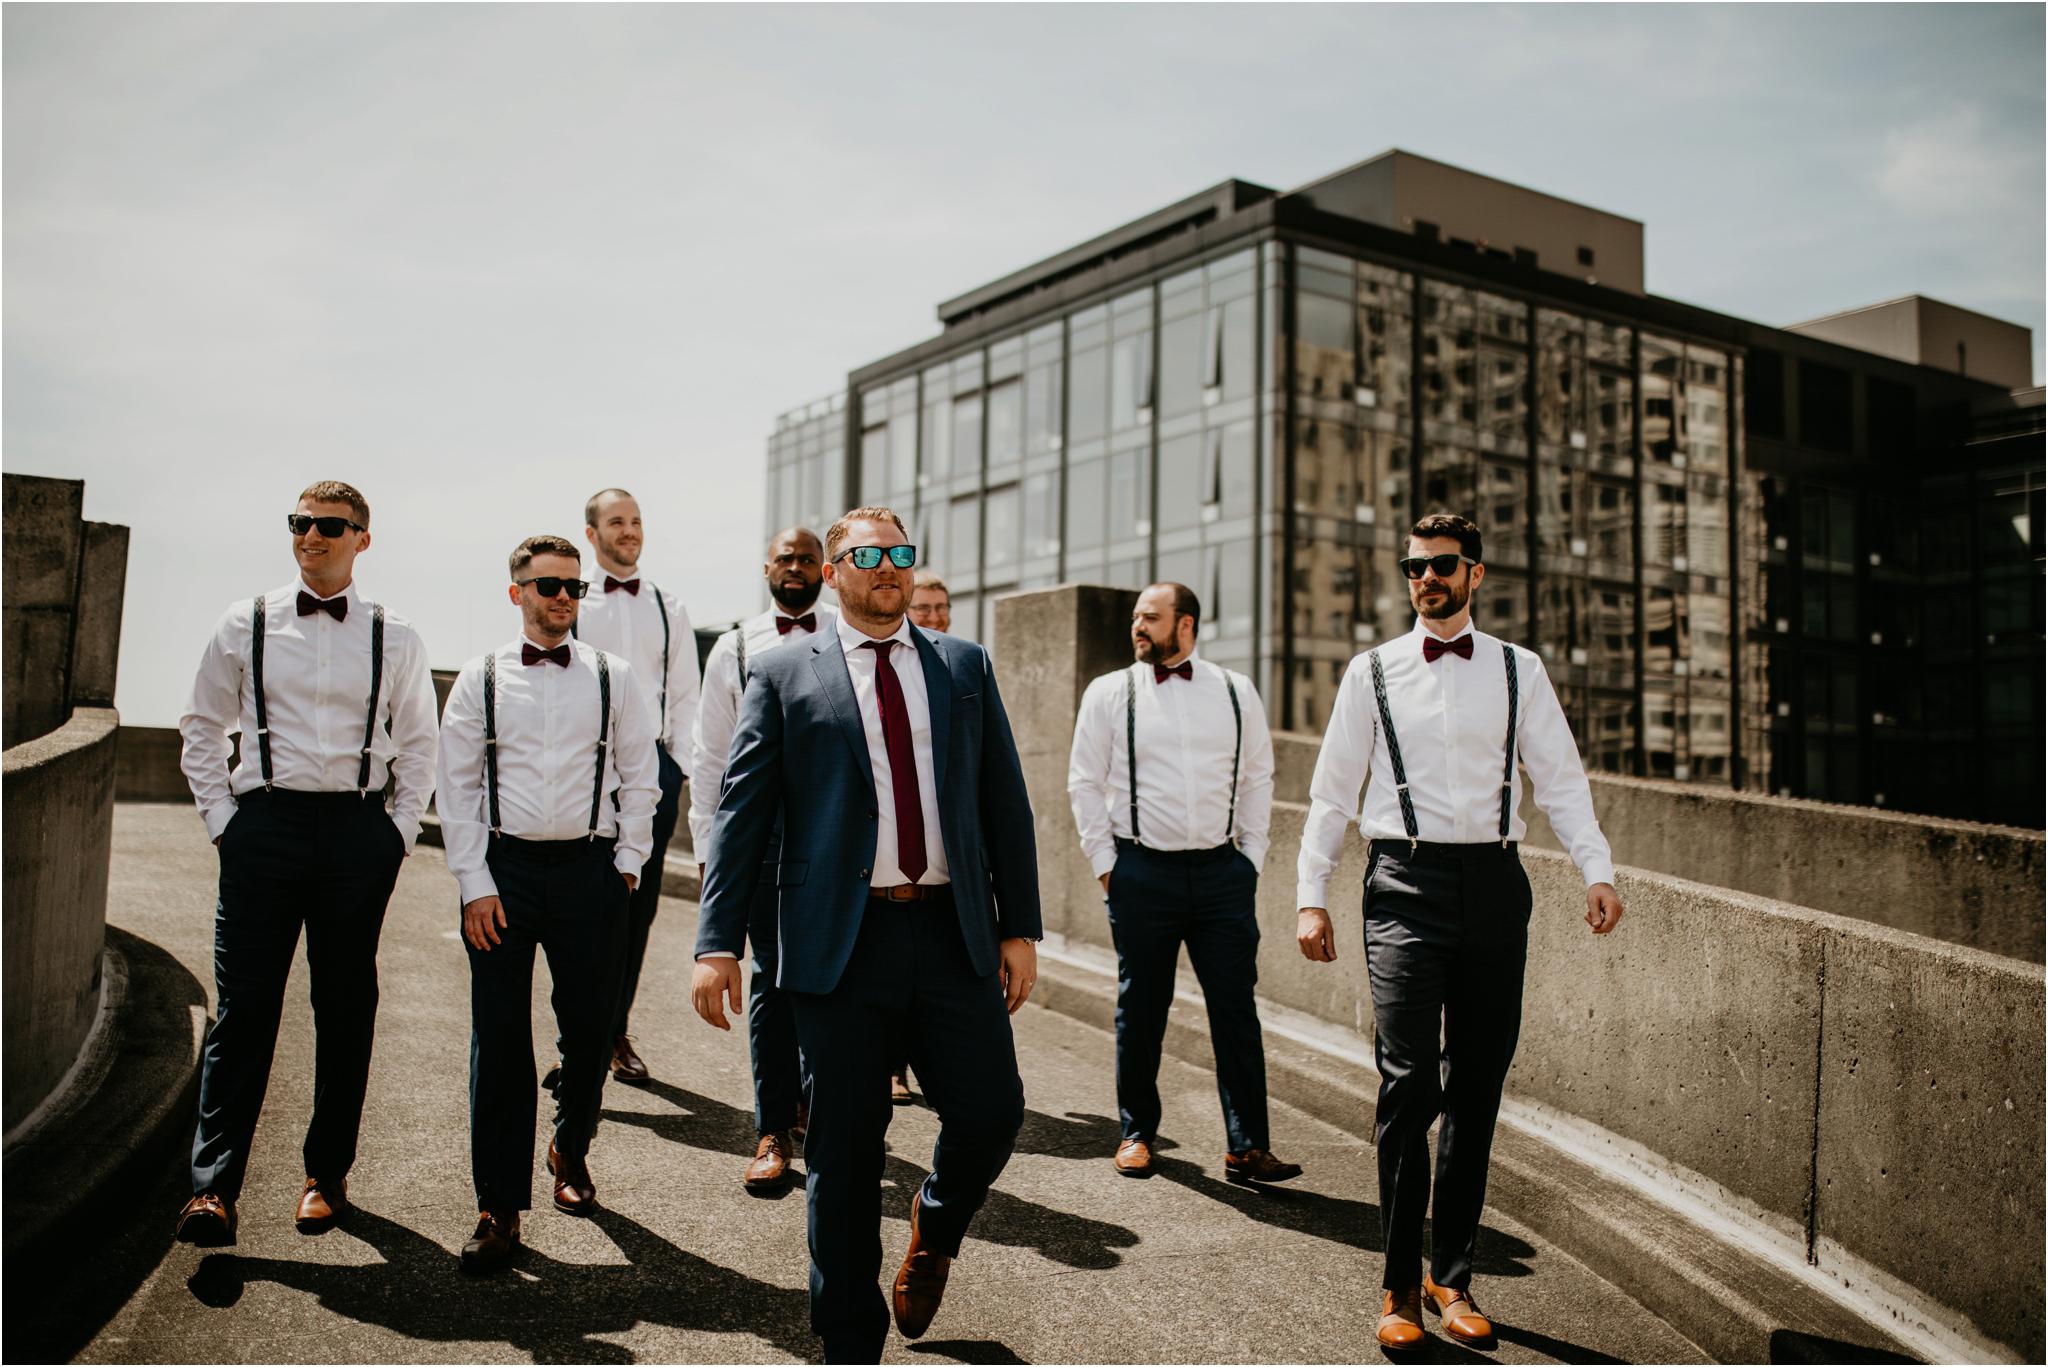 laura-and-matt-metropolist-urban-seattle-wedding-photographer-053.jpg